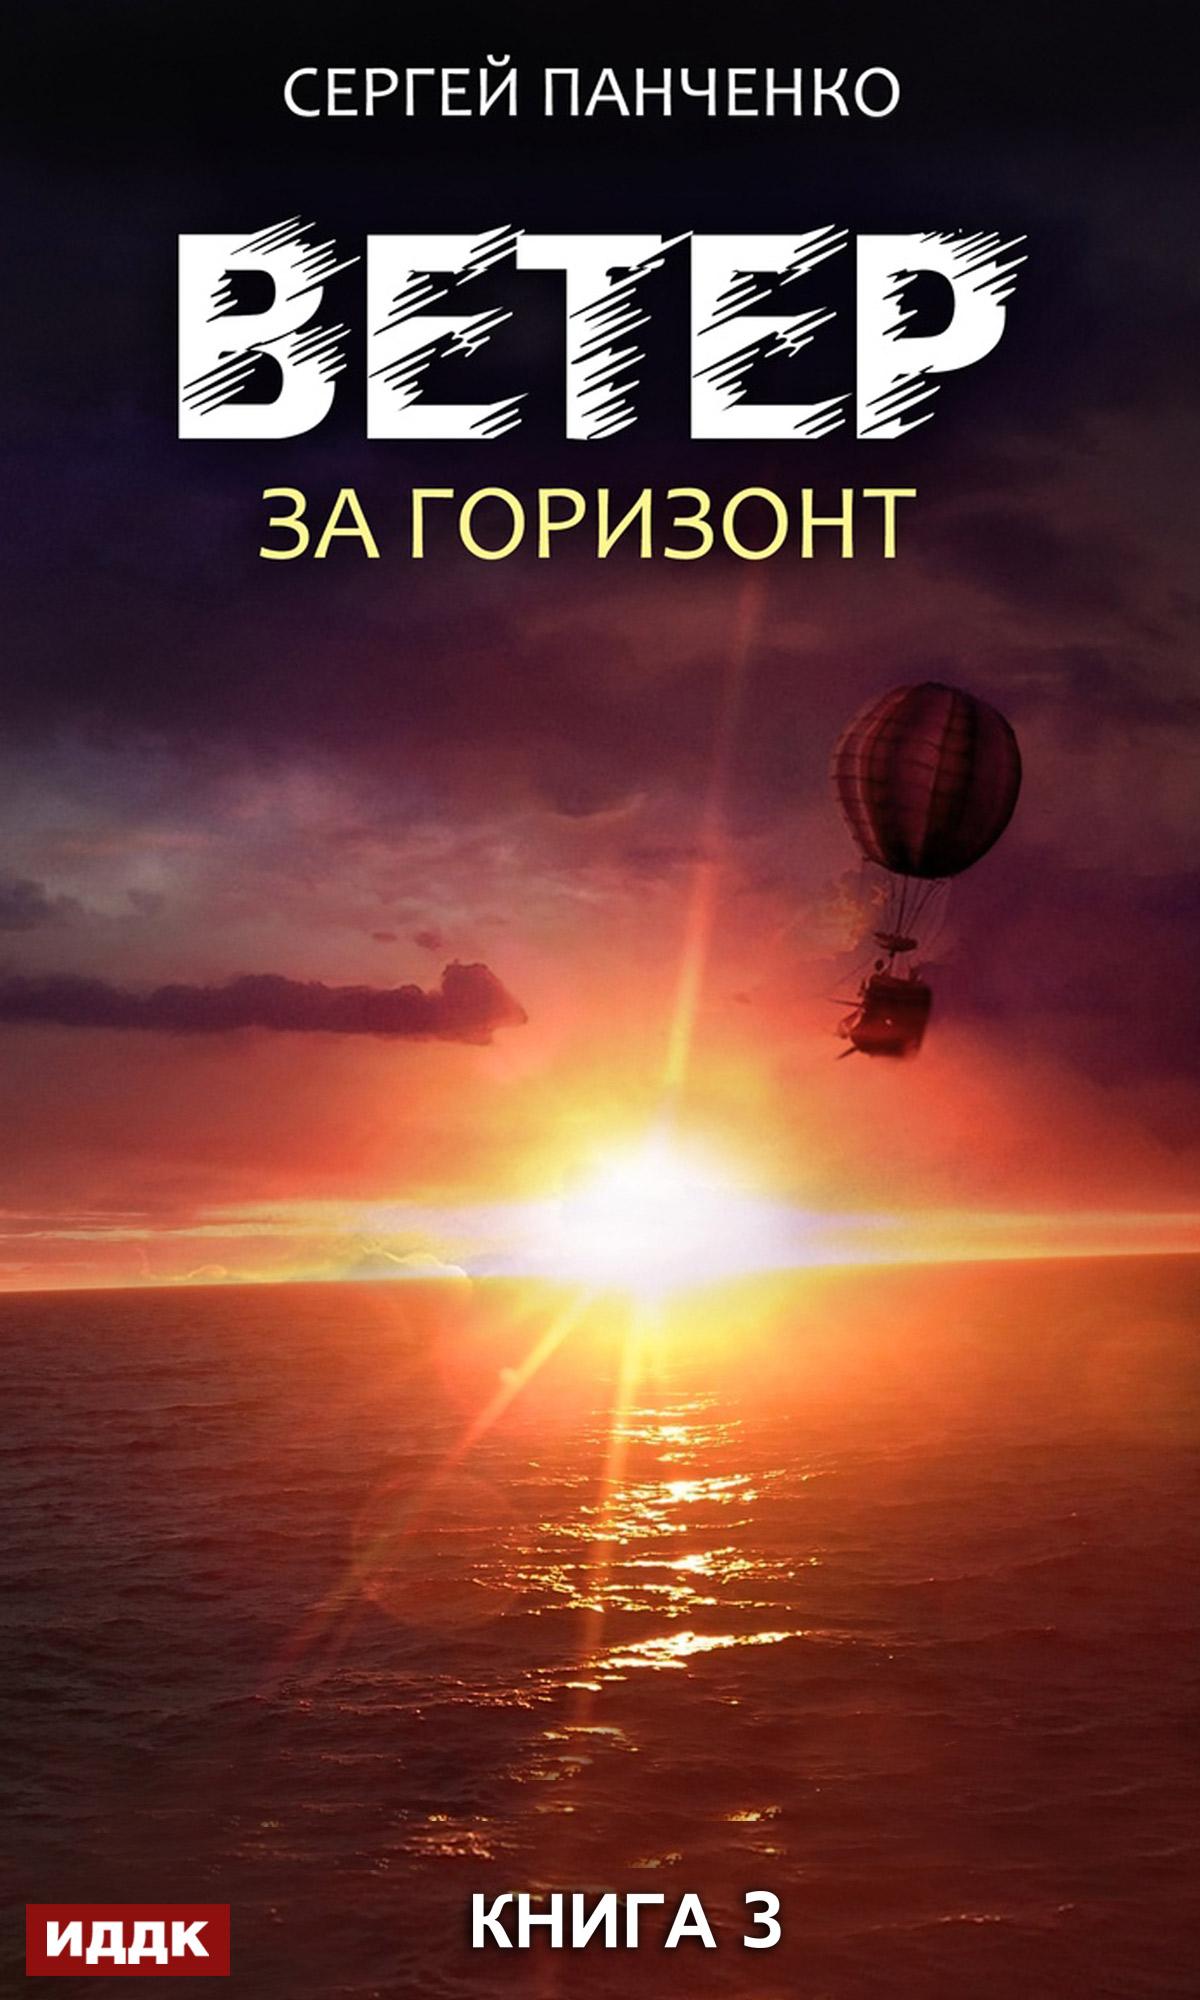 Сергей Панченко - Ветер. Книга 3. За горизонт